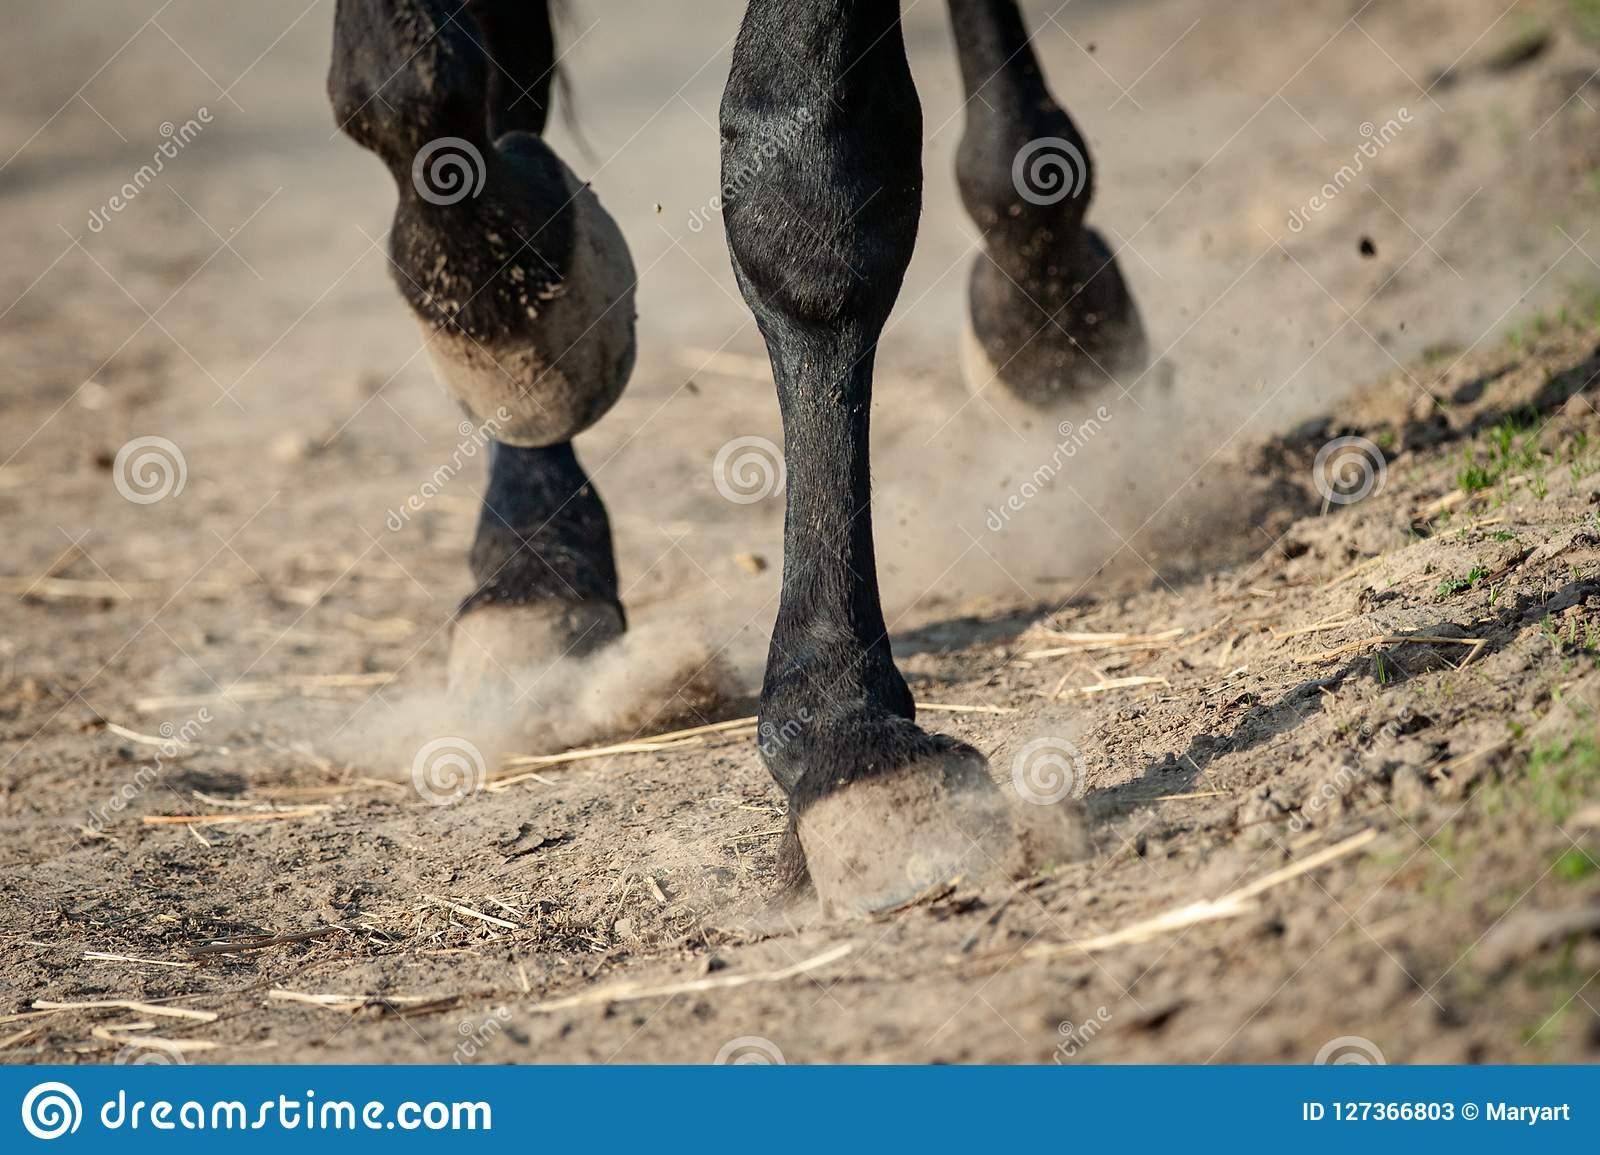 Сонник копыта лошади. к чему снится копыта лошади видеть во сне - сонник дома солнца